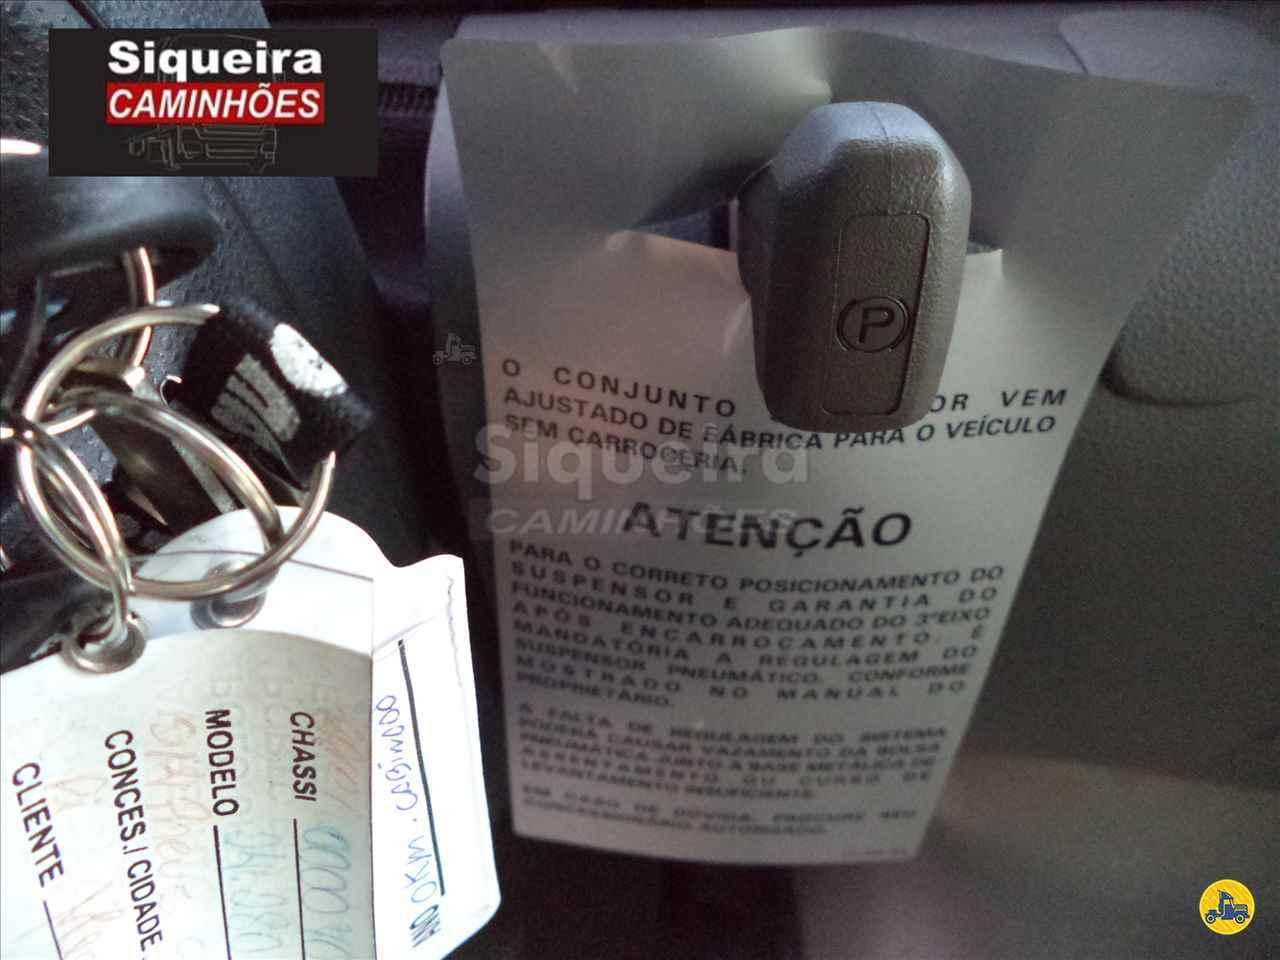 VOLKSWAGEN VW 24280 175km 2021/2022 Siqueira Caminhões